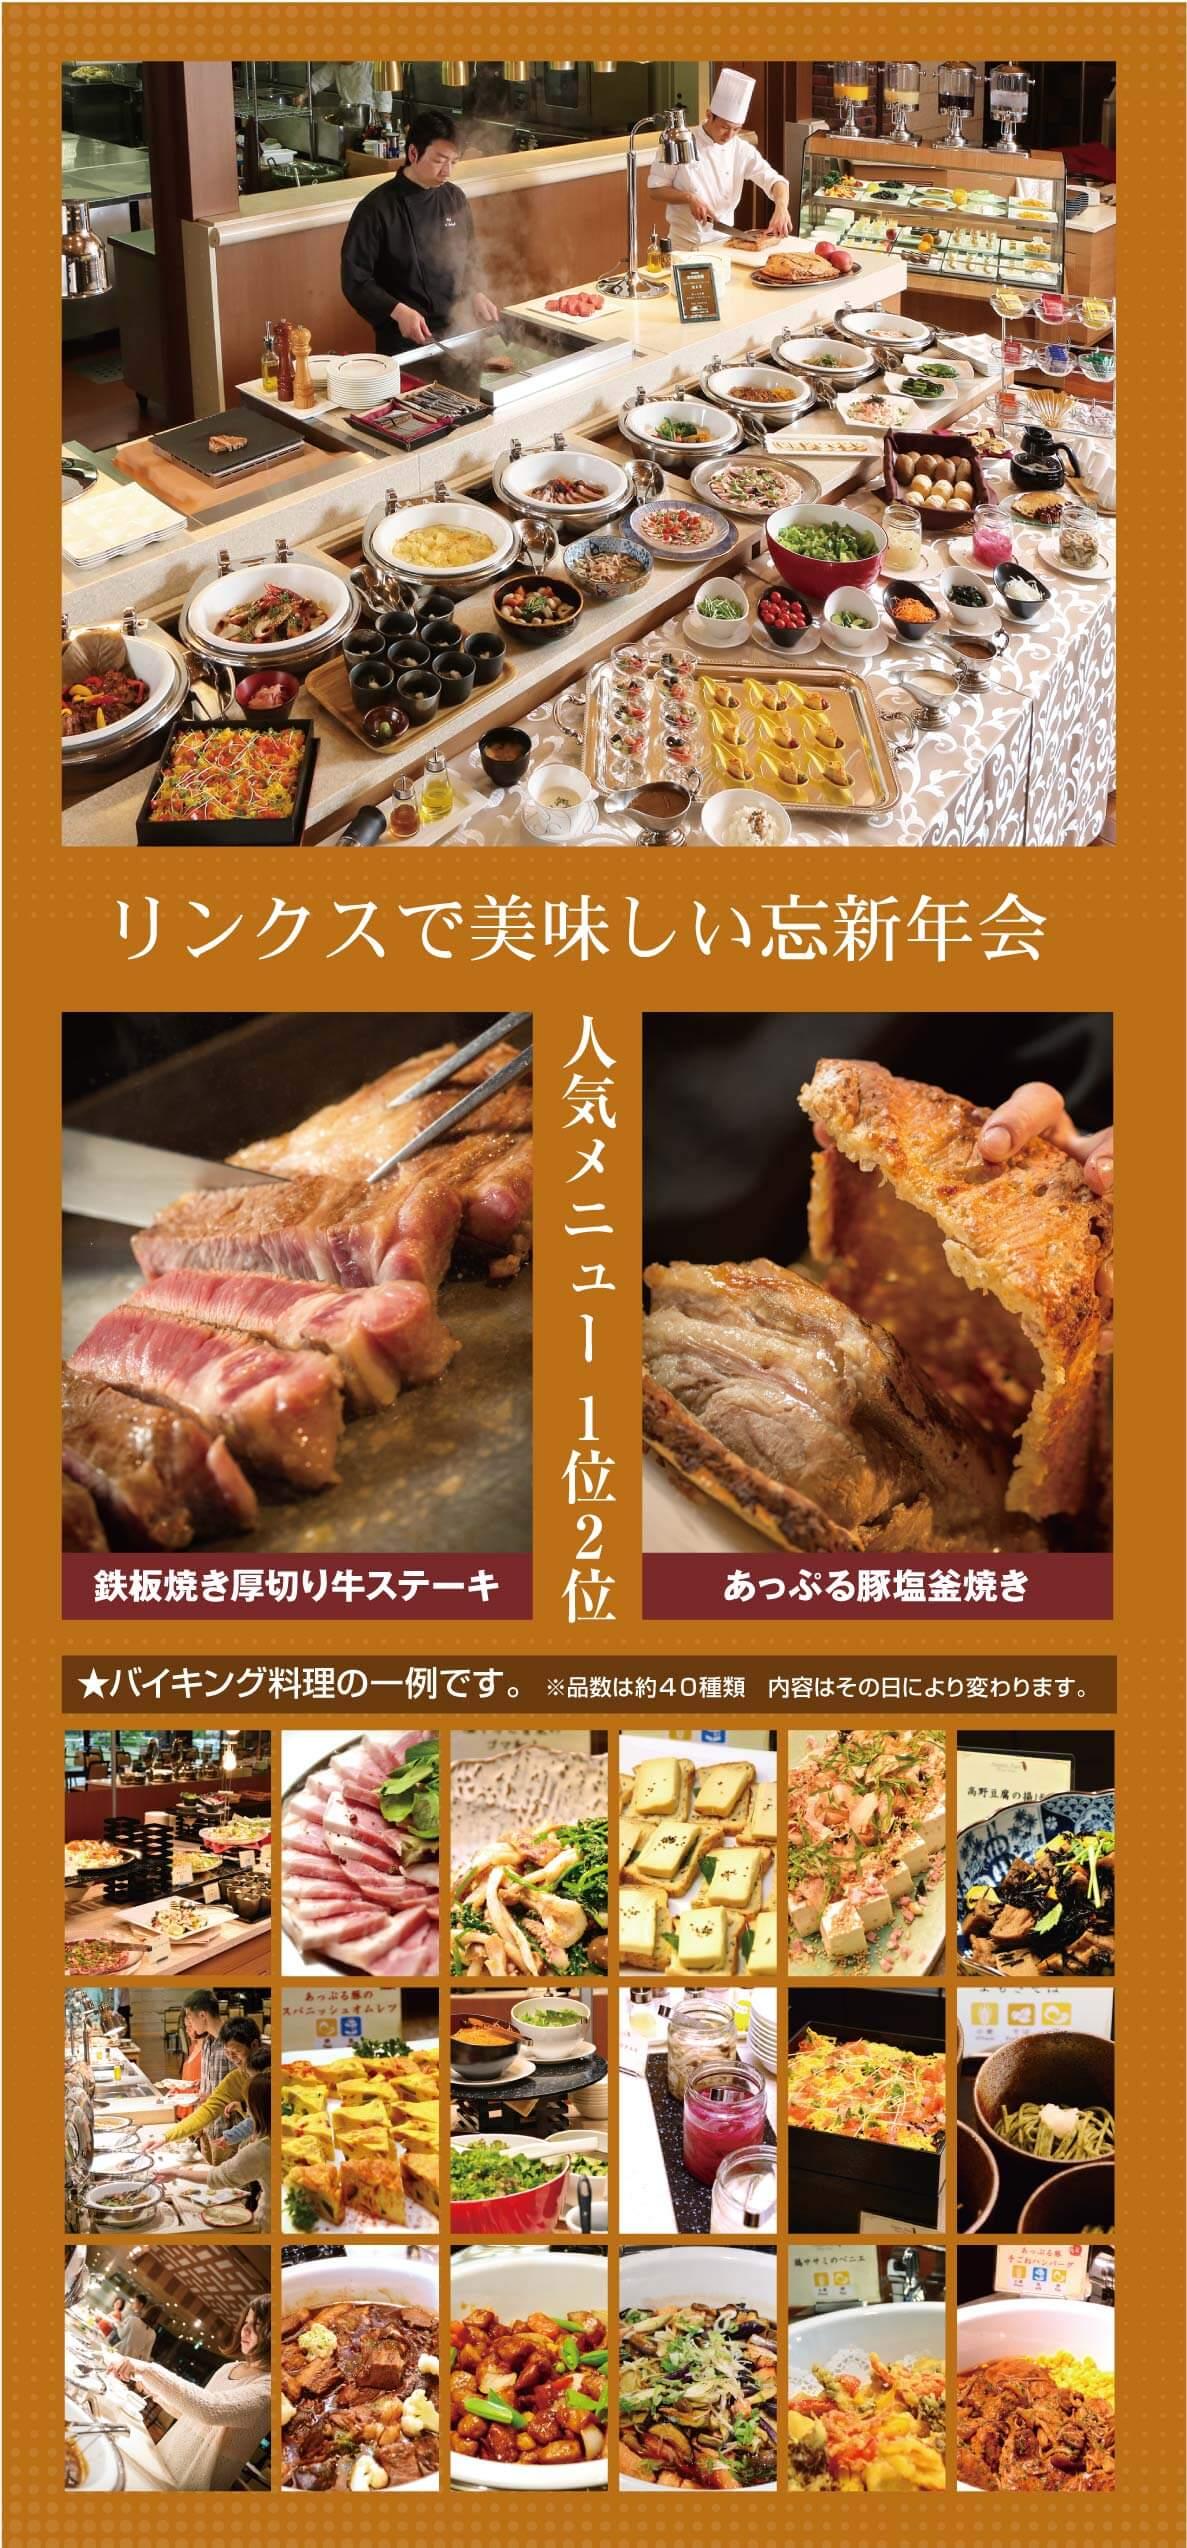 http://www.komagane-linx.co.jp/blogimages/kamiina201611-2-2.jpg